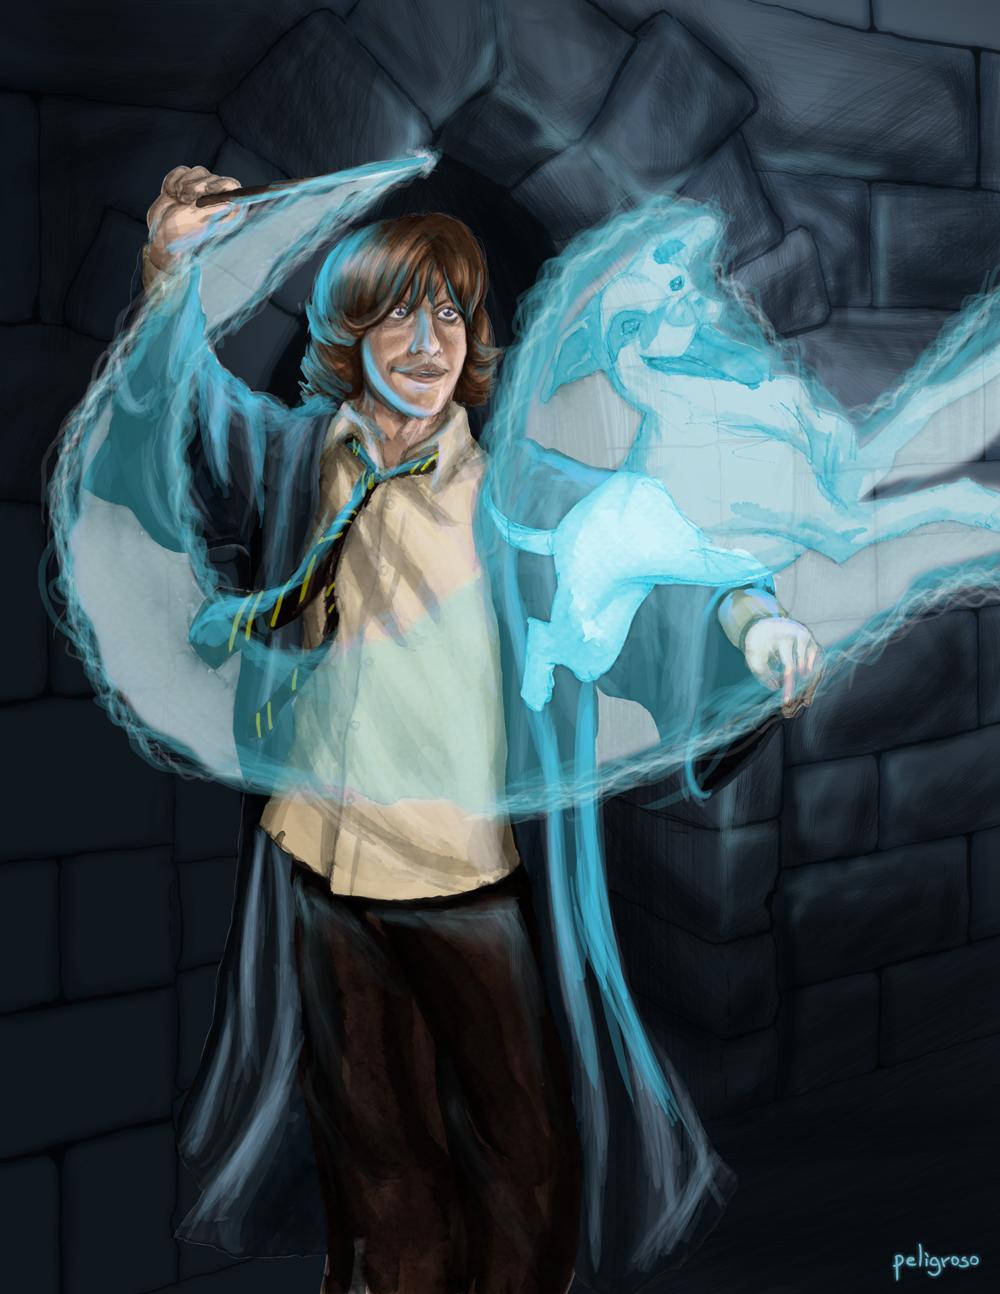 Patronus de Ron Weasley by peligrosocool on DeviantArt  |Ron Weasley Patronus